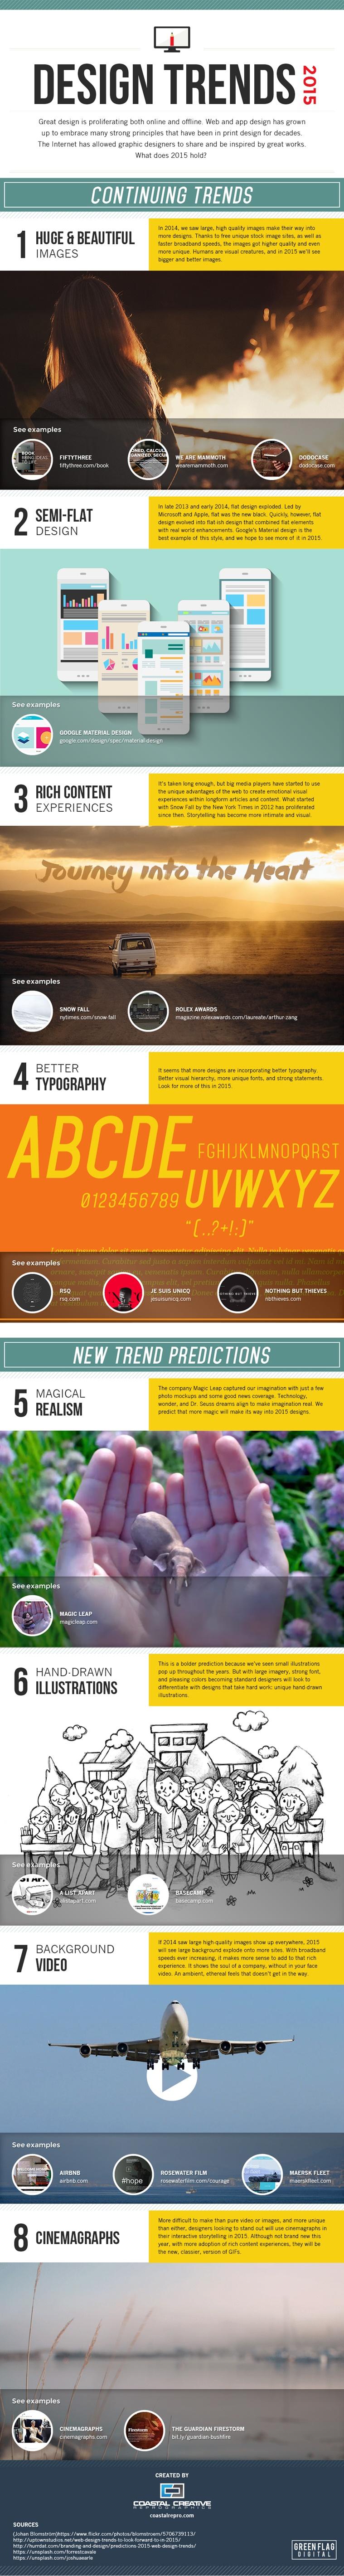 Infografía tendencias de diseño 2015